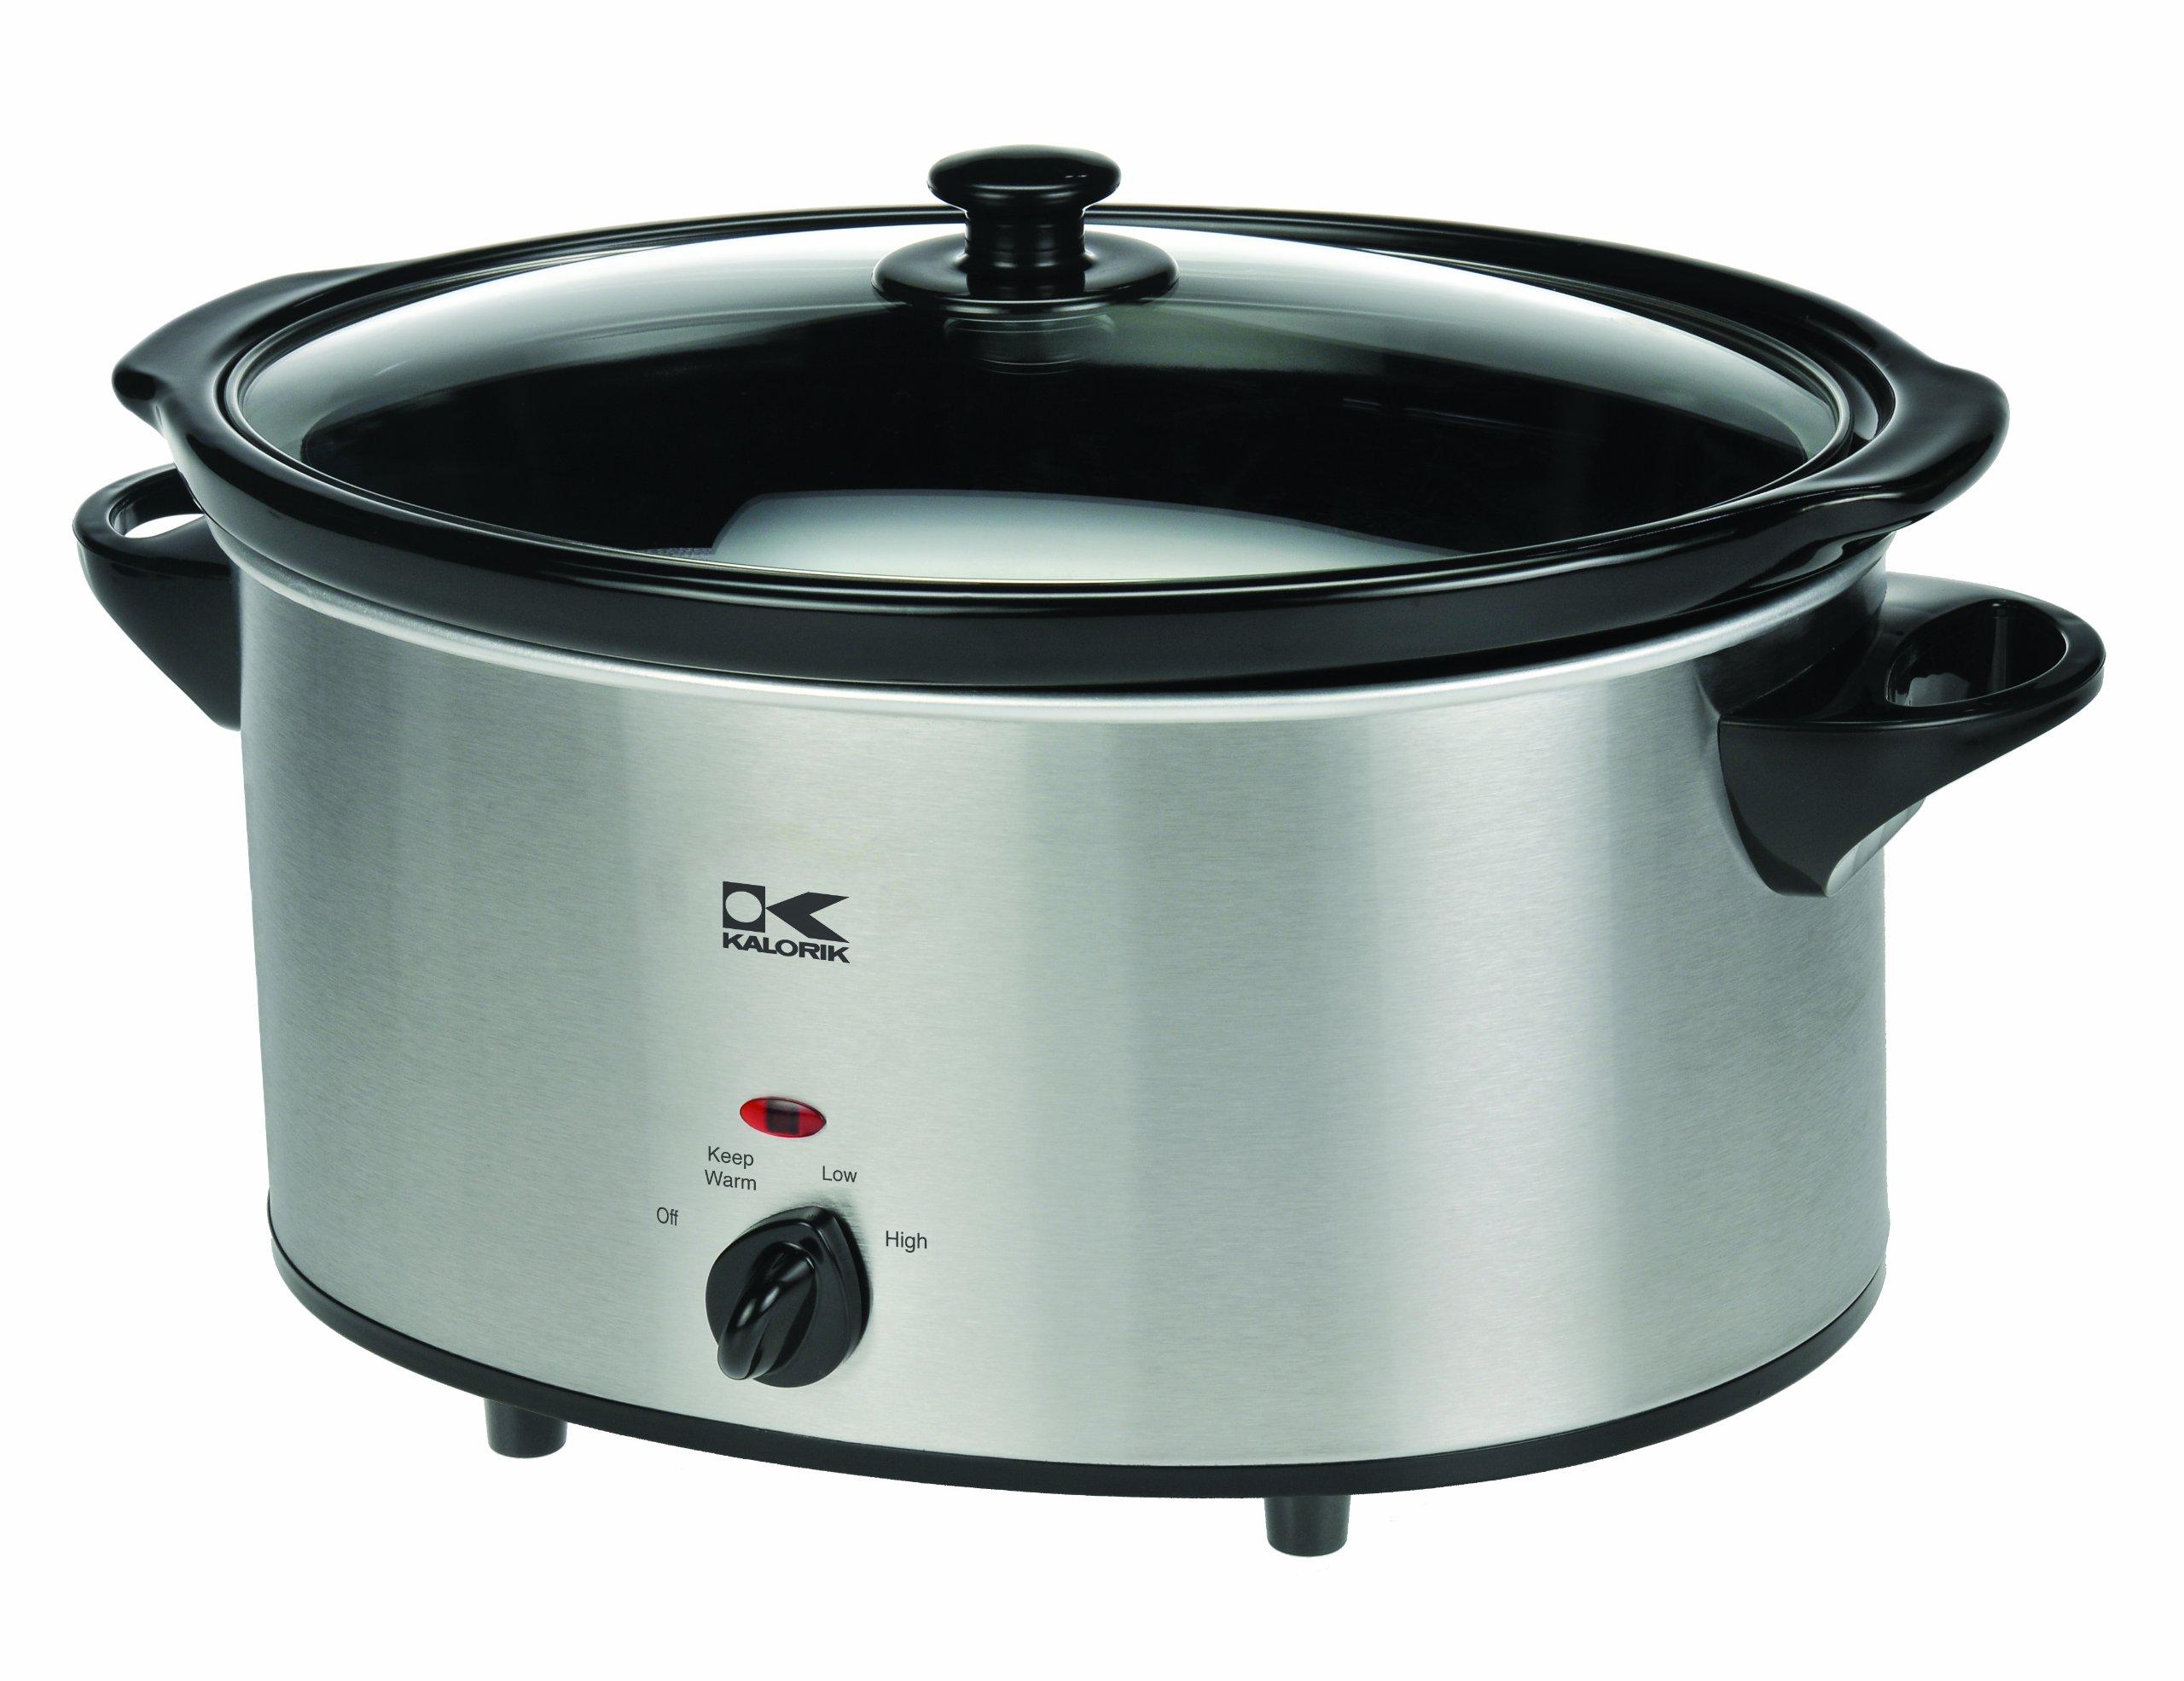 Kalorik Oval Slow Cooker, Stainless Steel, 6-Qt.